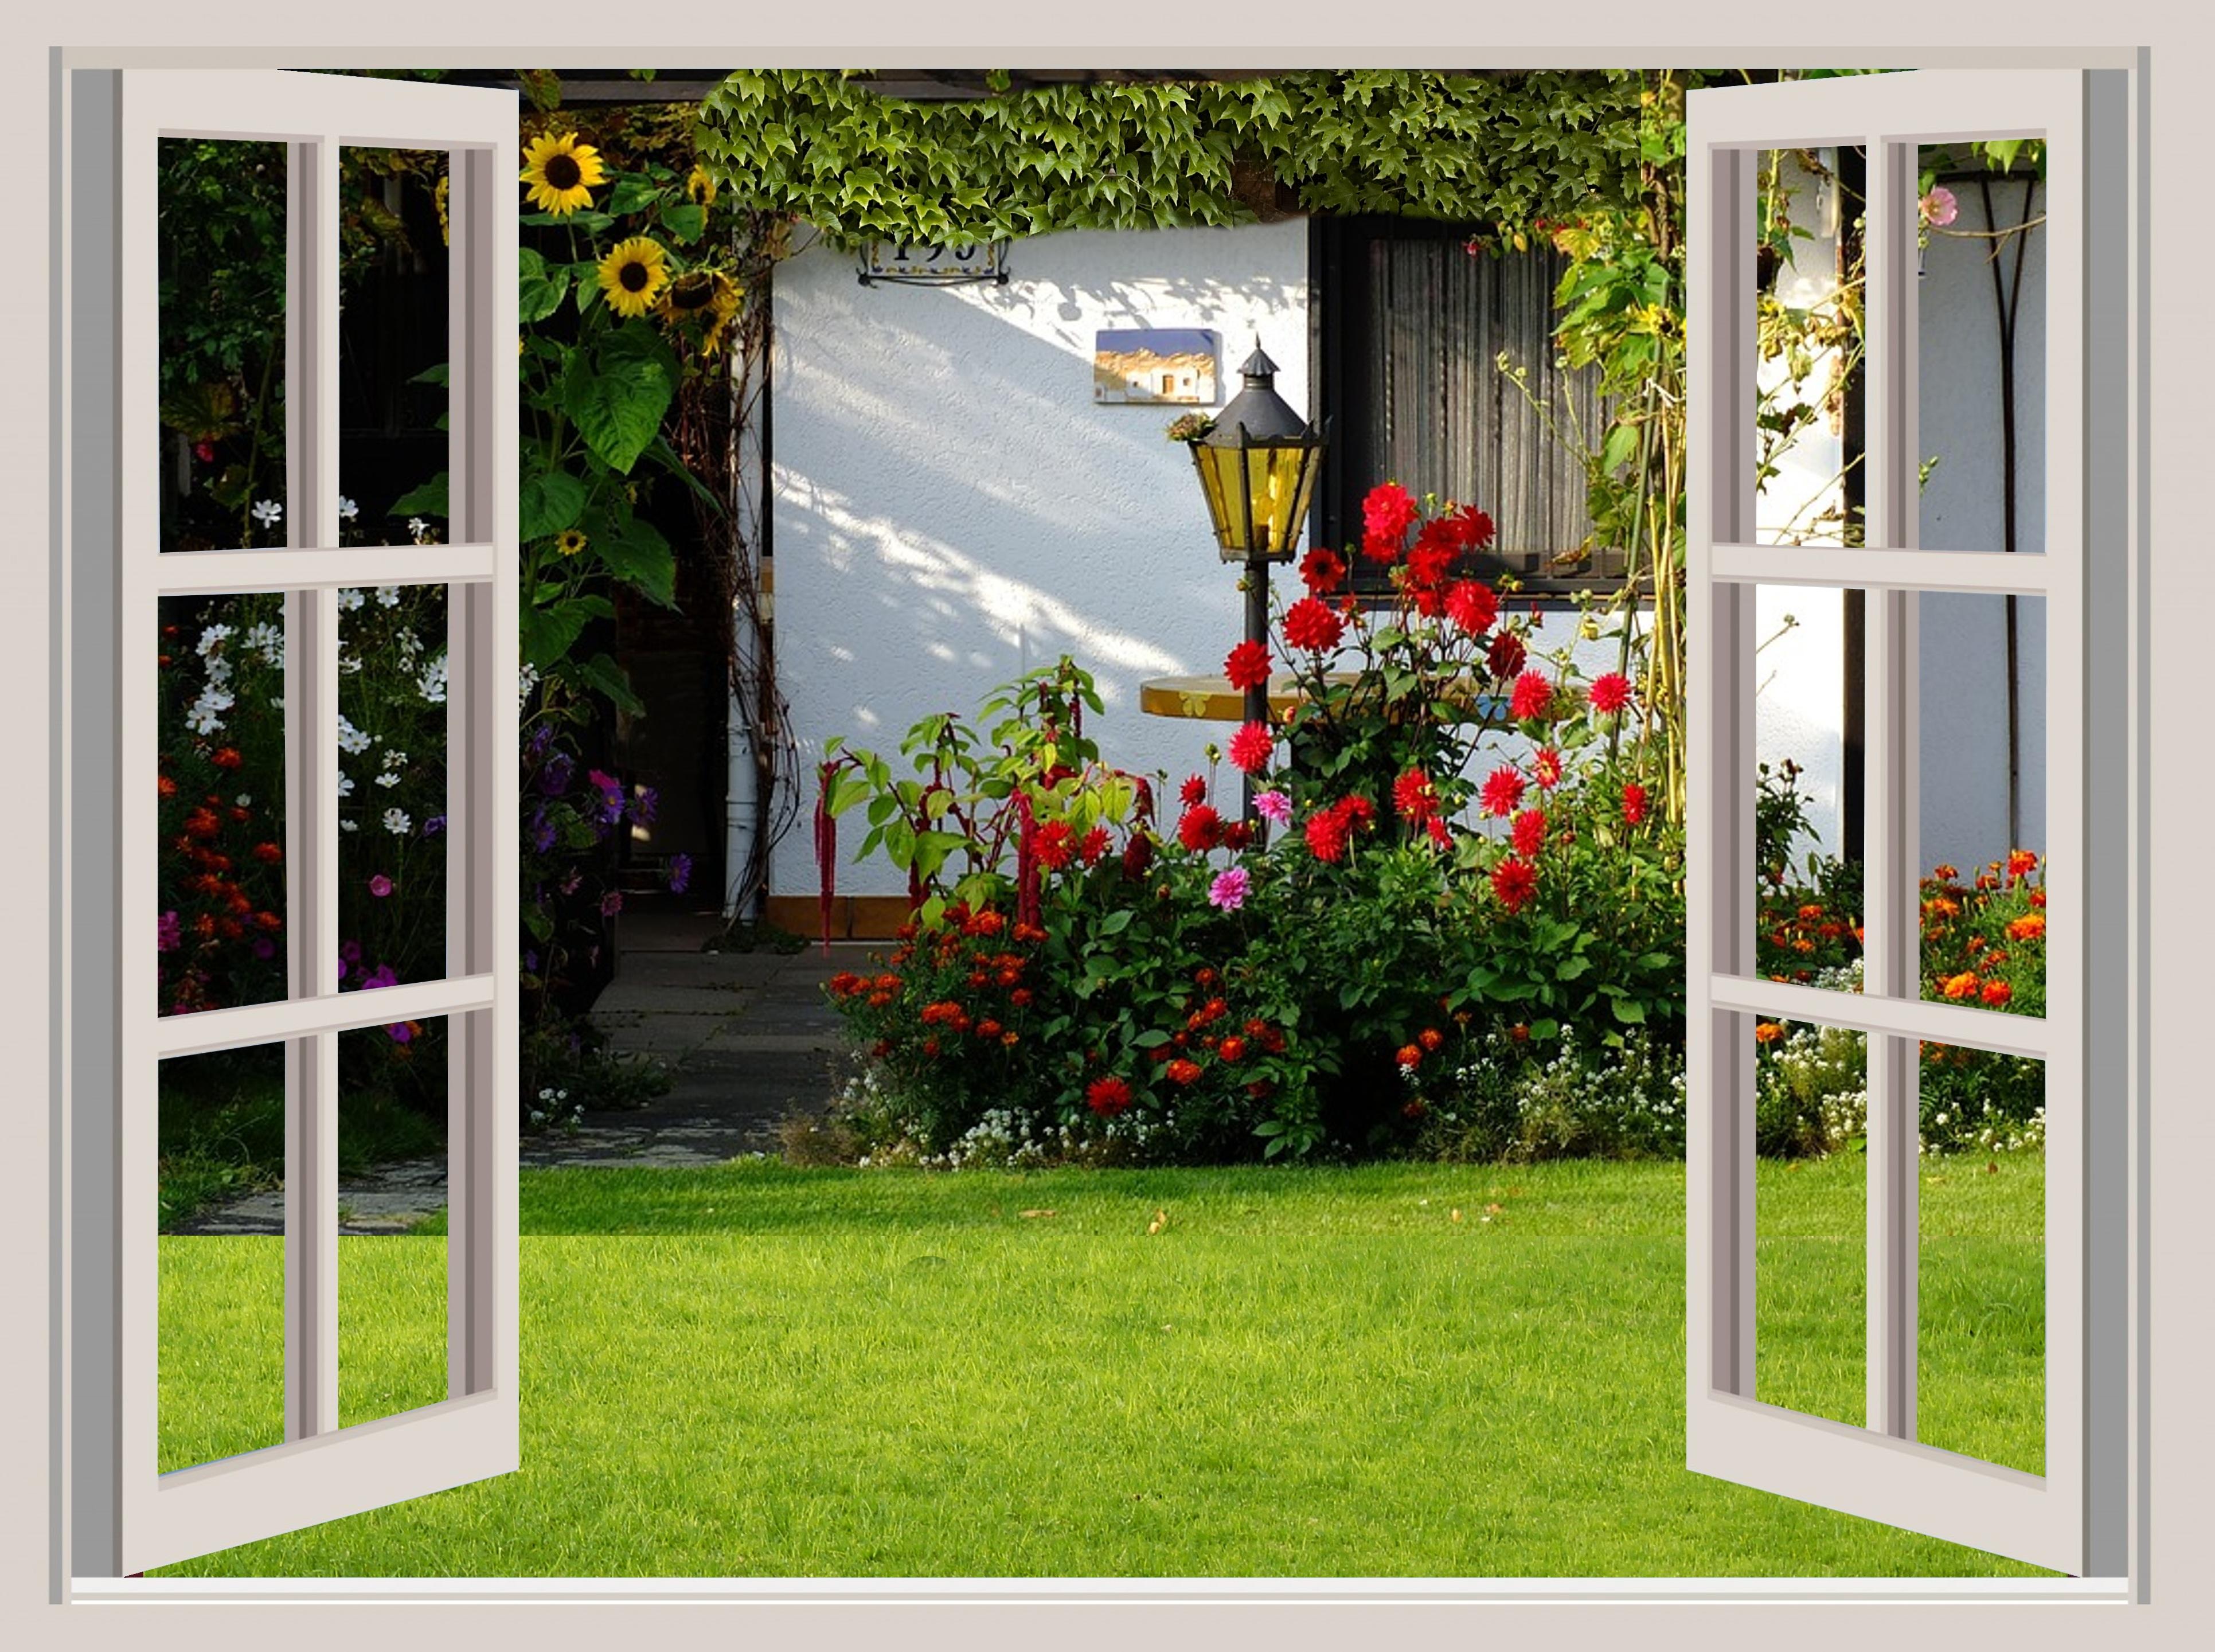 Fotos gratis : naturaleza, ligero, florecer, porche, idílico, arco ...